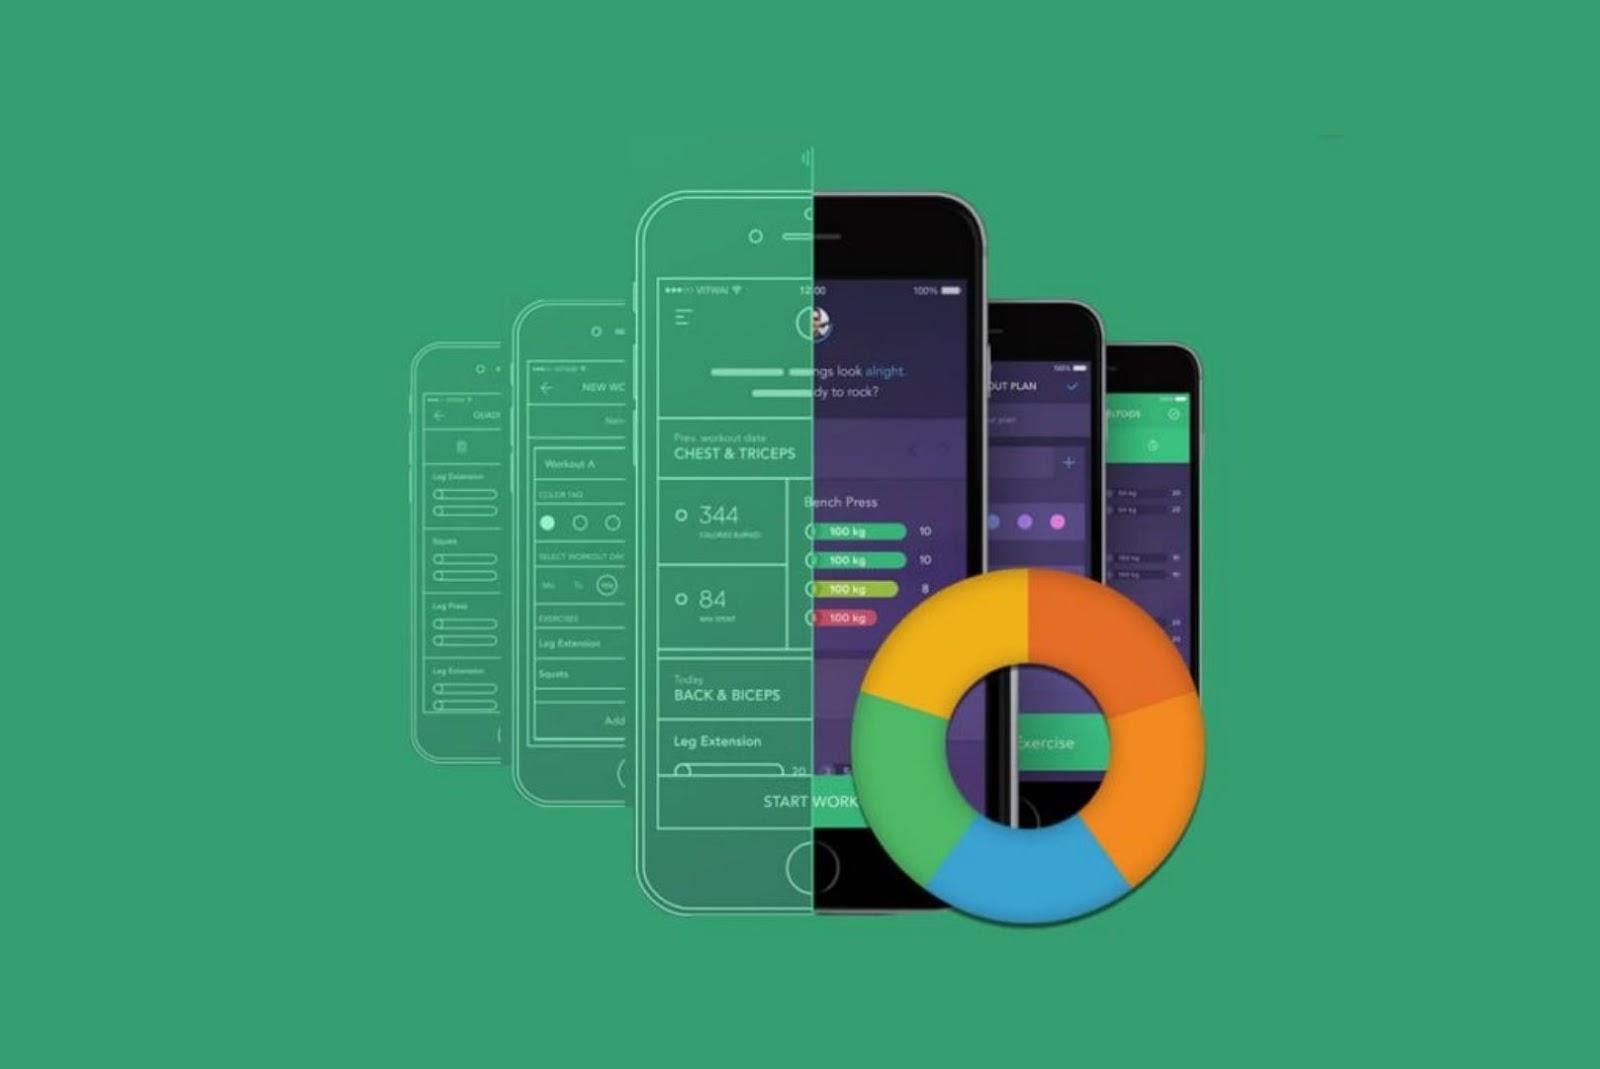 UI UX design factors that impact app development costs